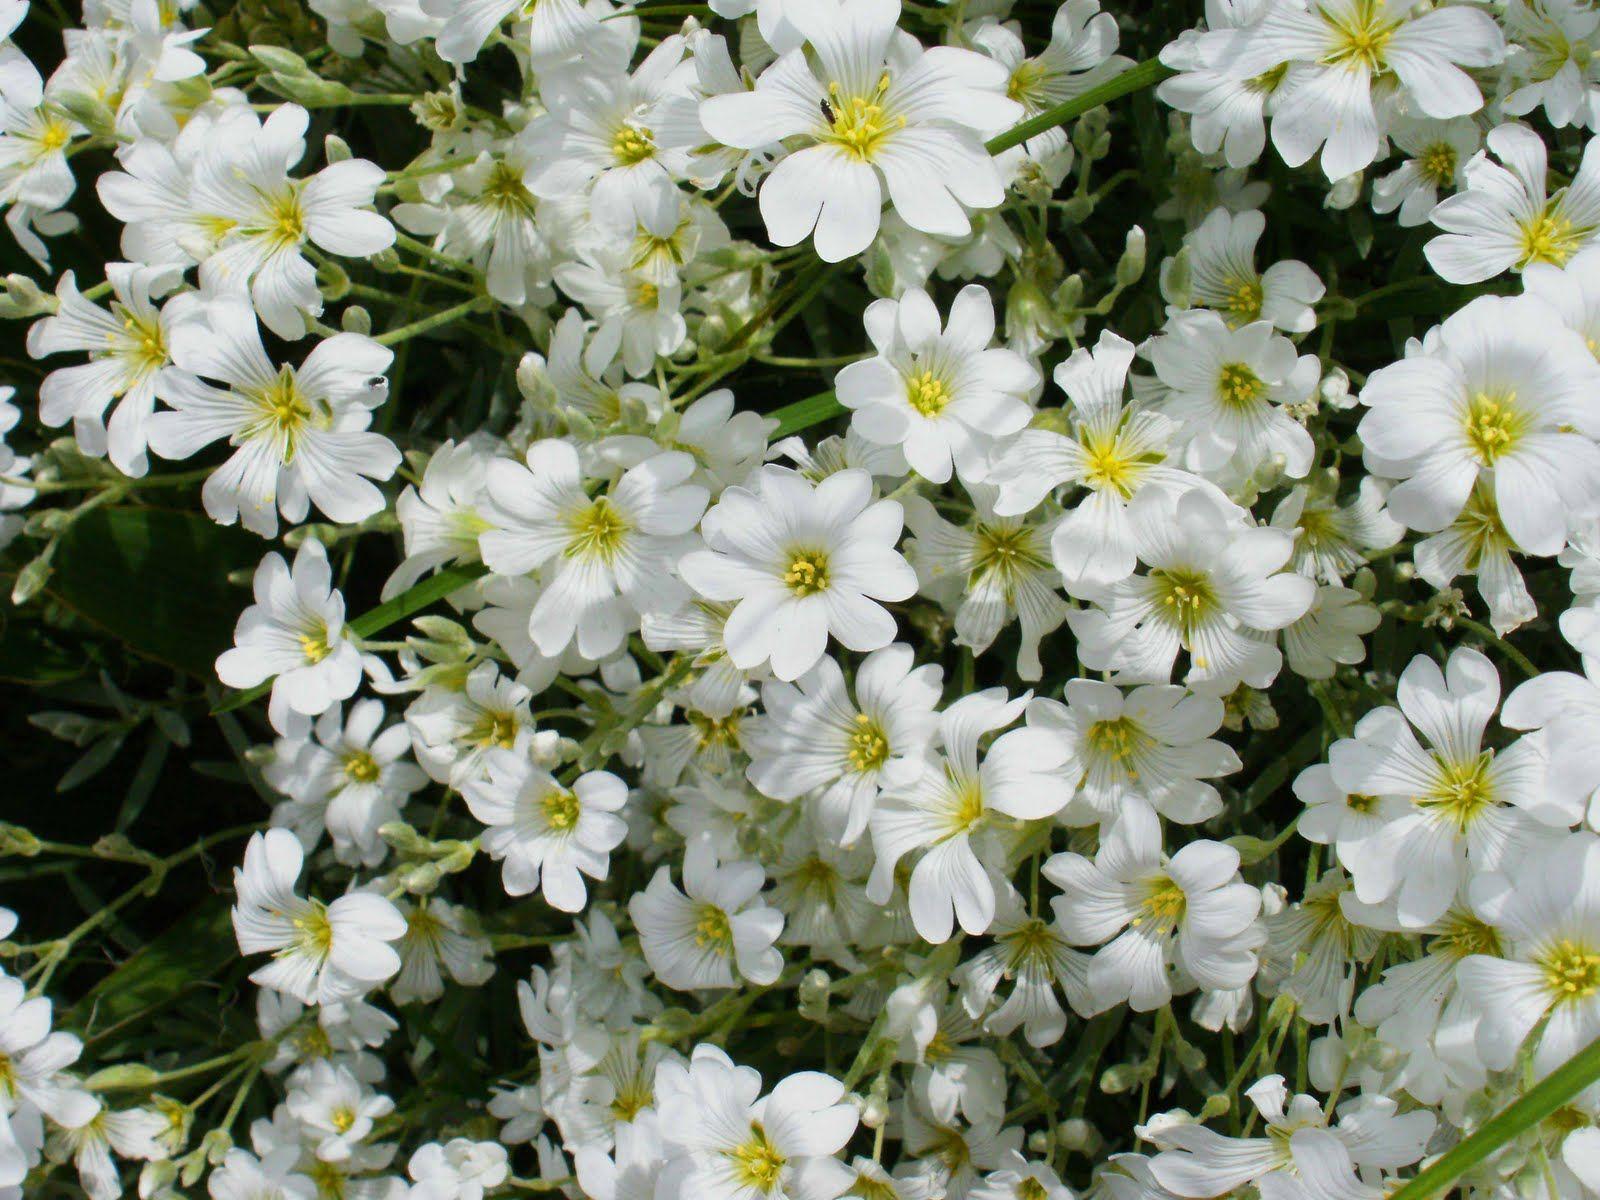 Cerastium Tormentosum Aka Snow In Summer White Flowers In May